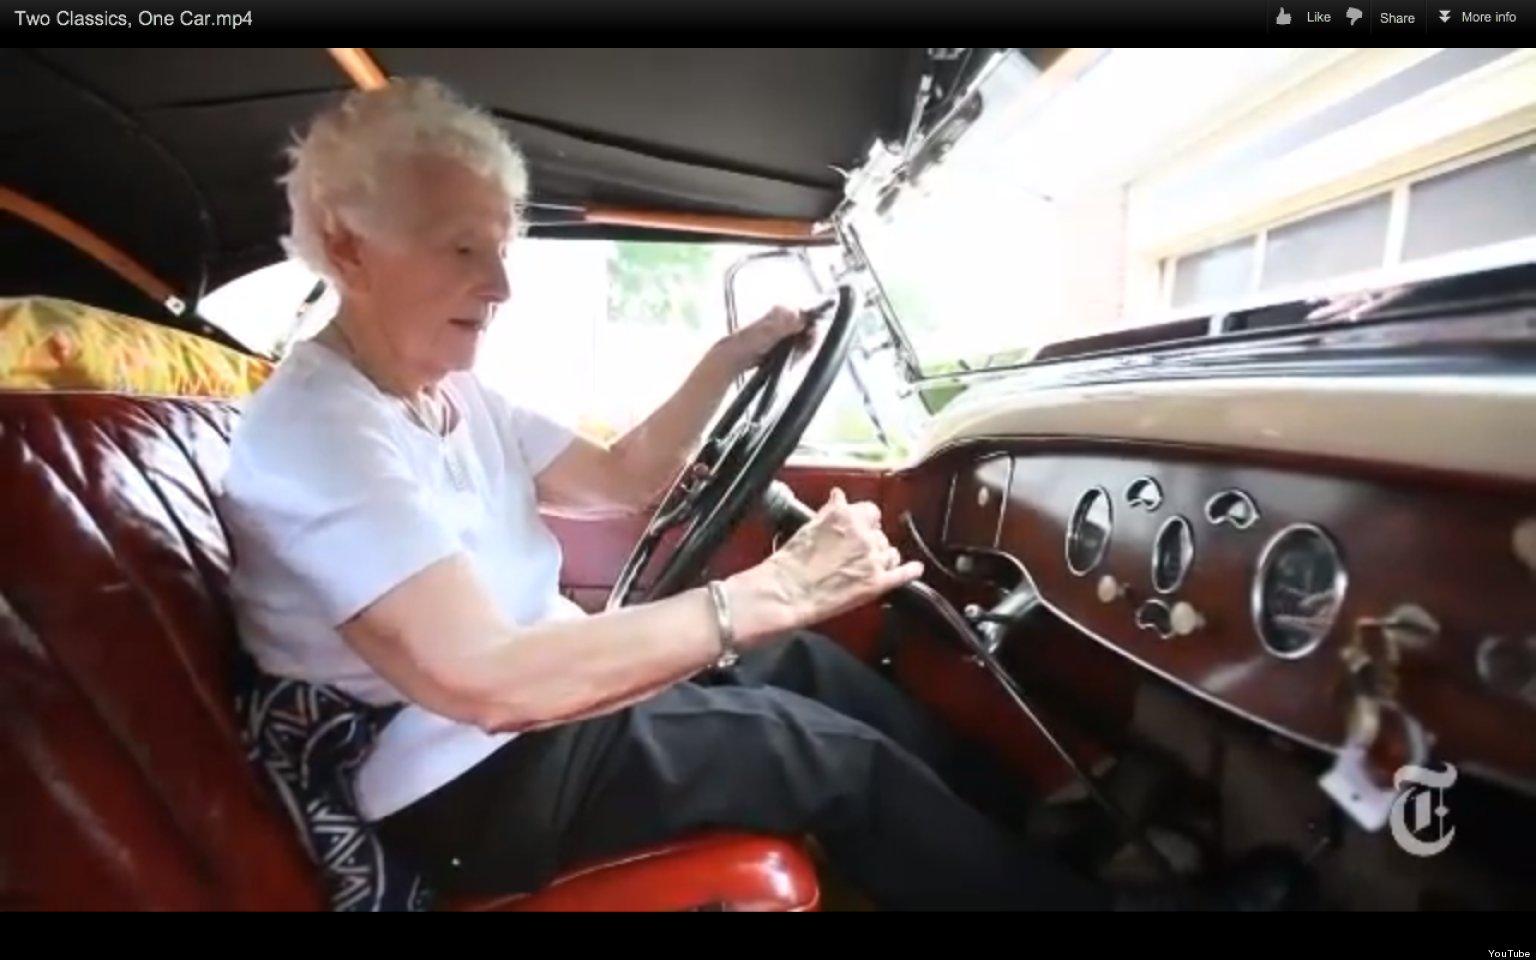 Do sports cars make you feel young again? - MX-5 Miata Forum